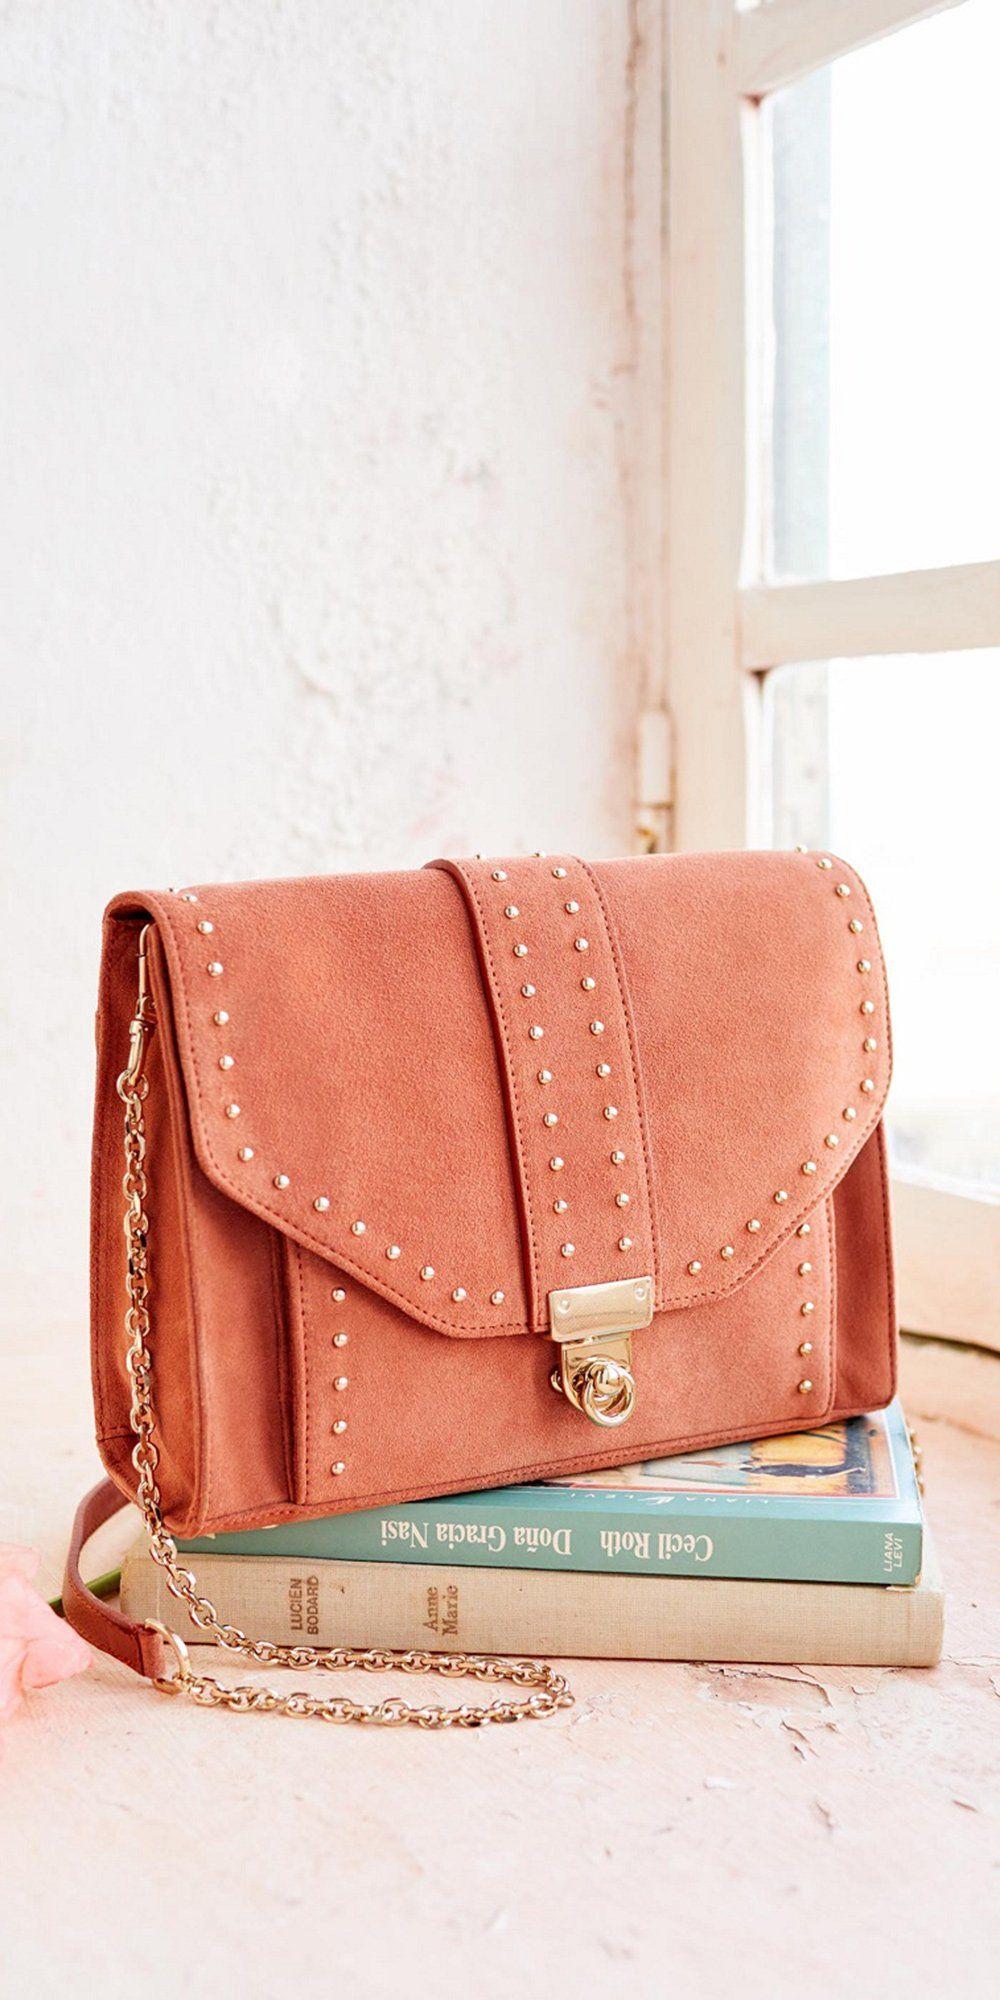 10 Sac Sac Pinterest qu'on cartable sacs cartables adore mode vqr6vYw